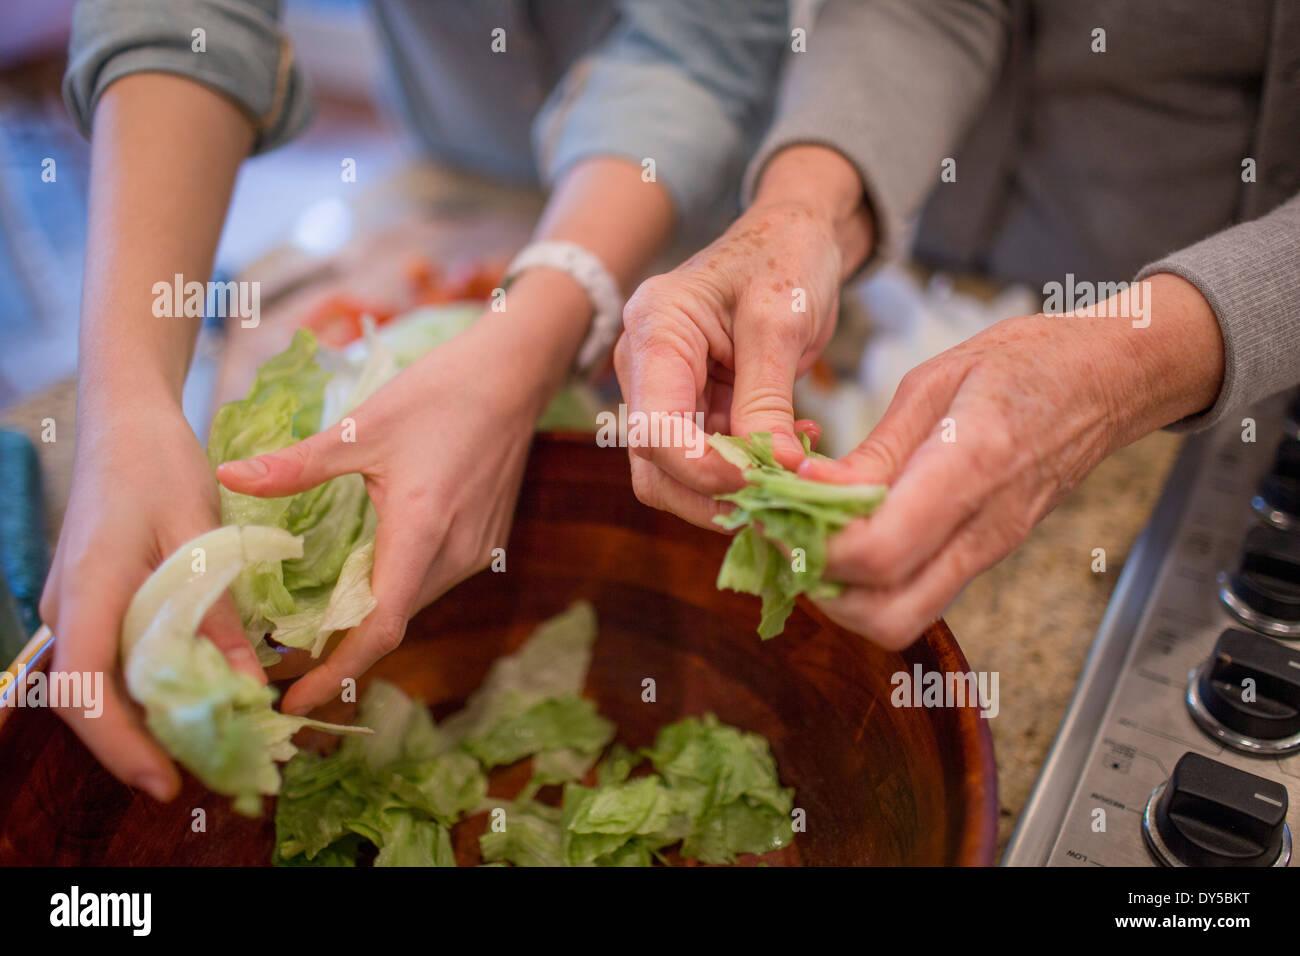 Senior woman and granddaughter preparing lettuce for salad - Stock Image